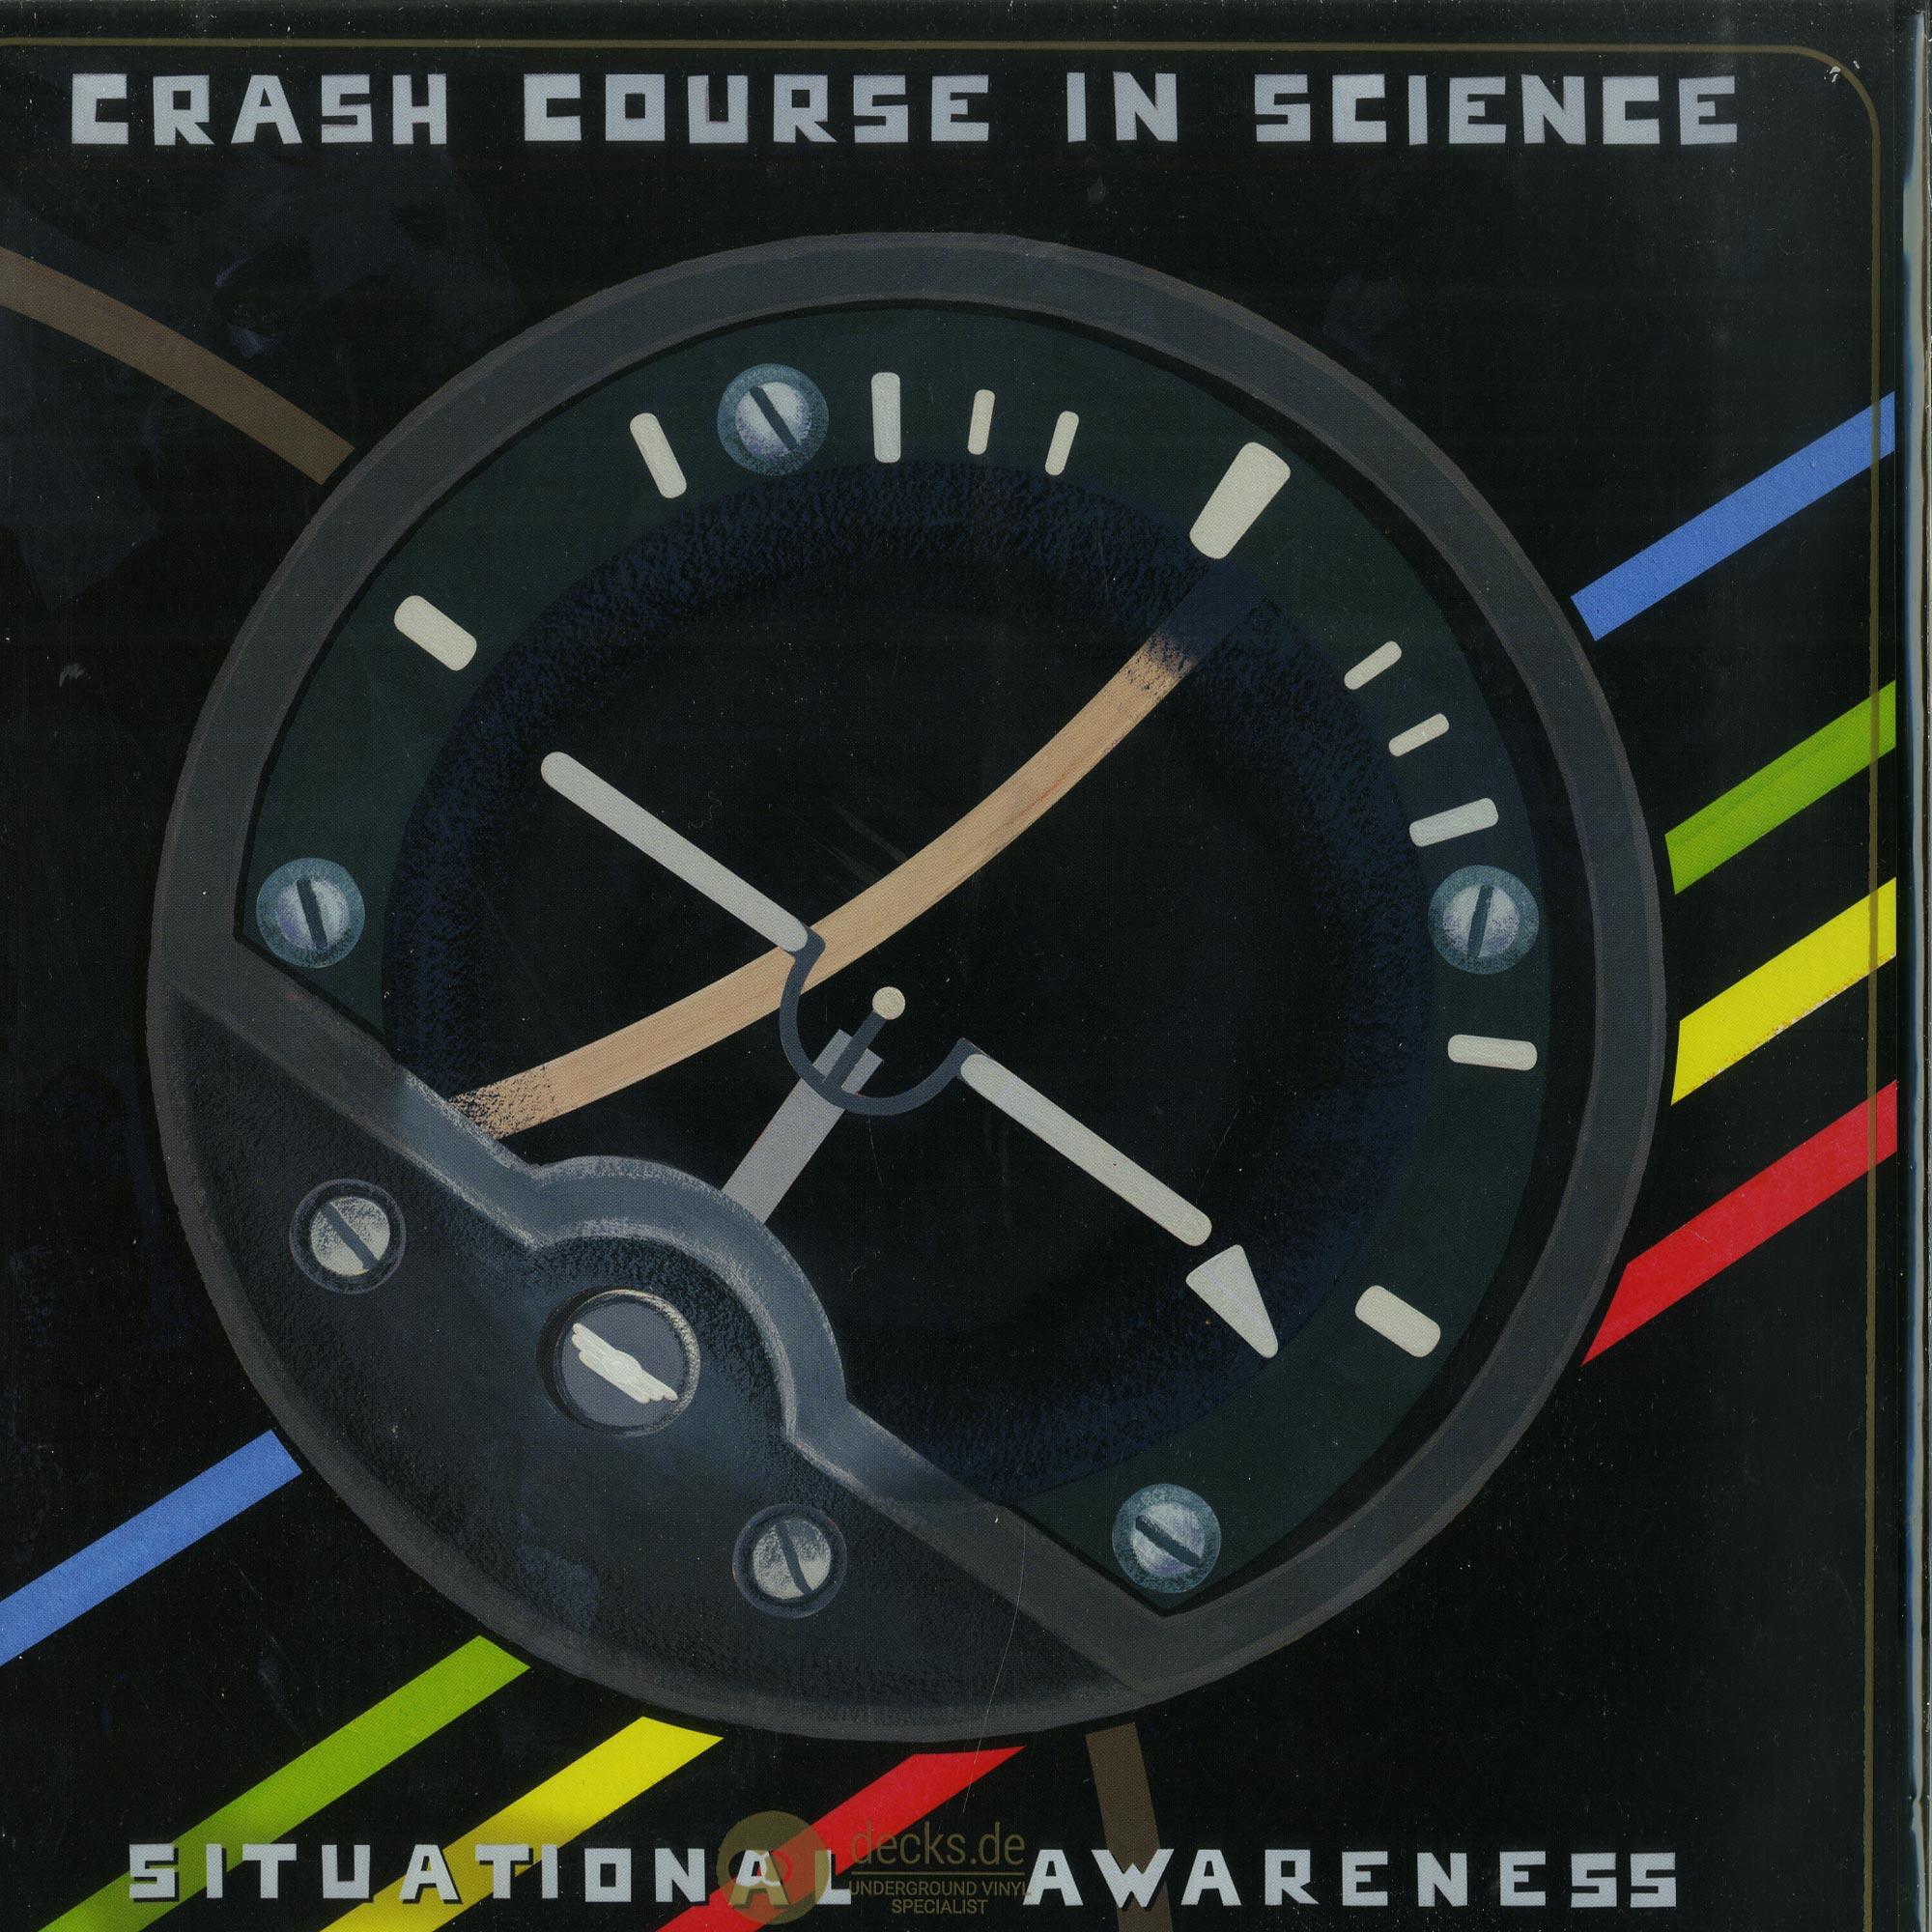 Crash Course In Science - SITUATIONAL AWARENESS